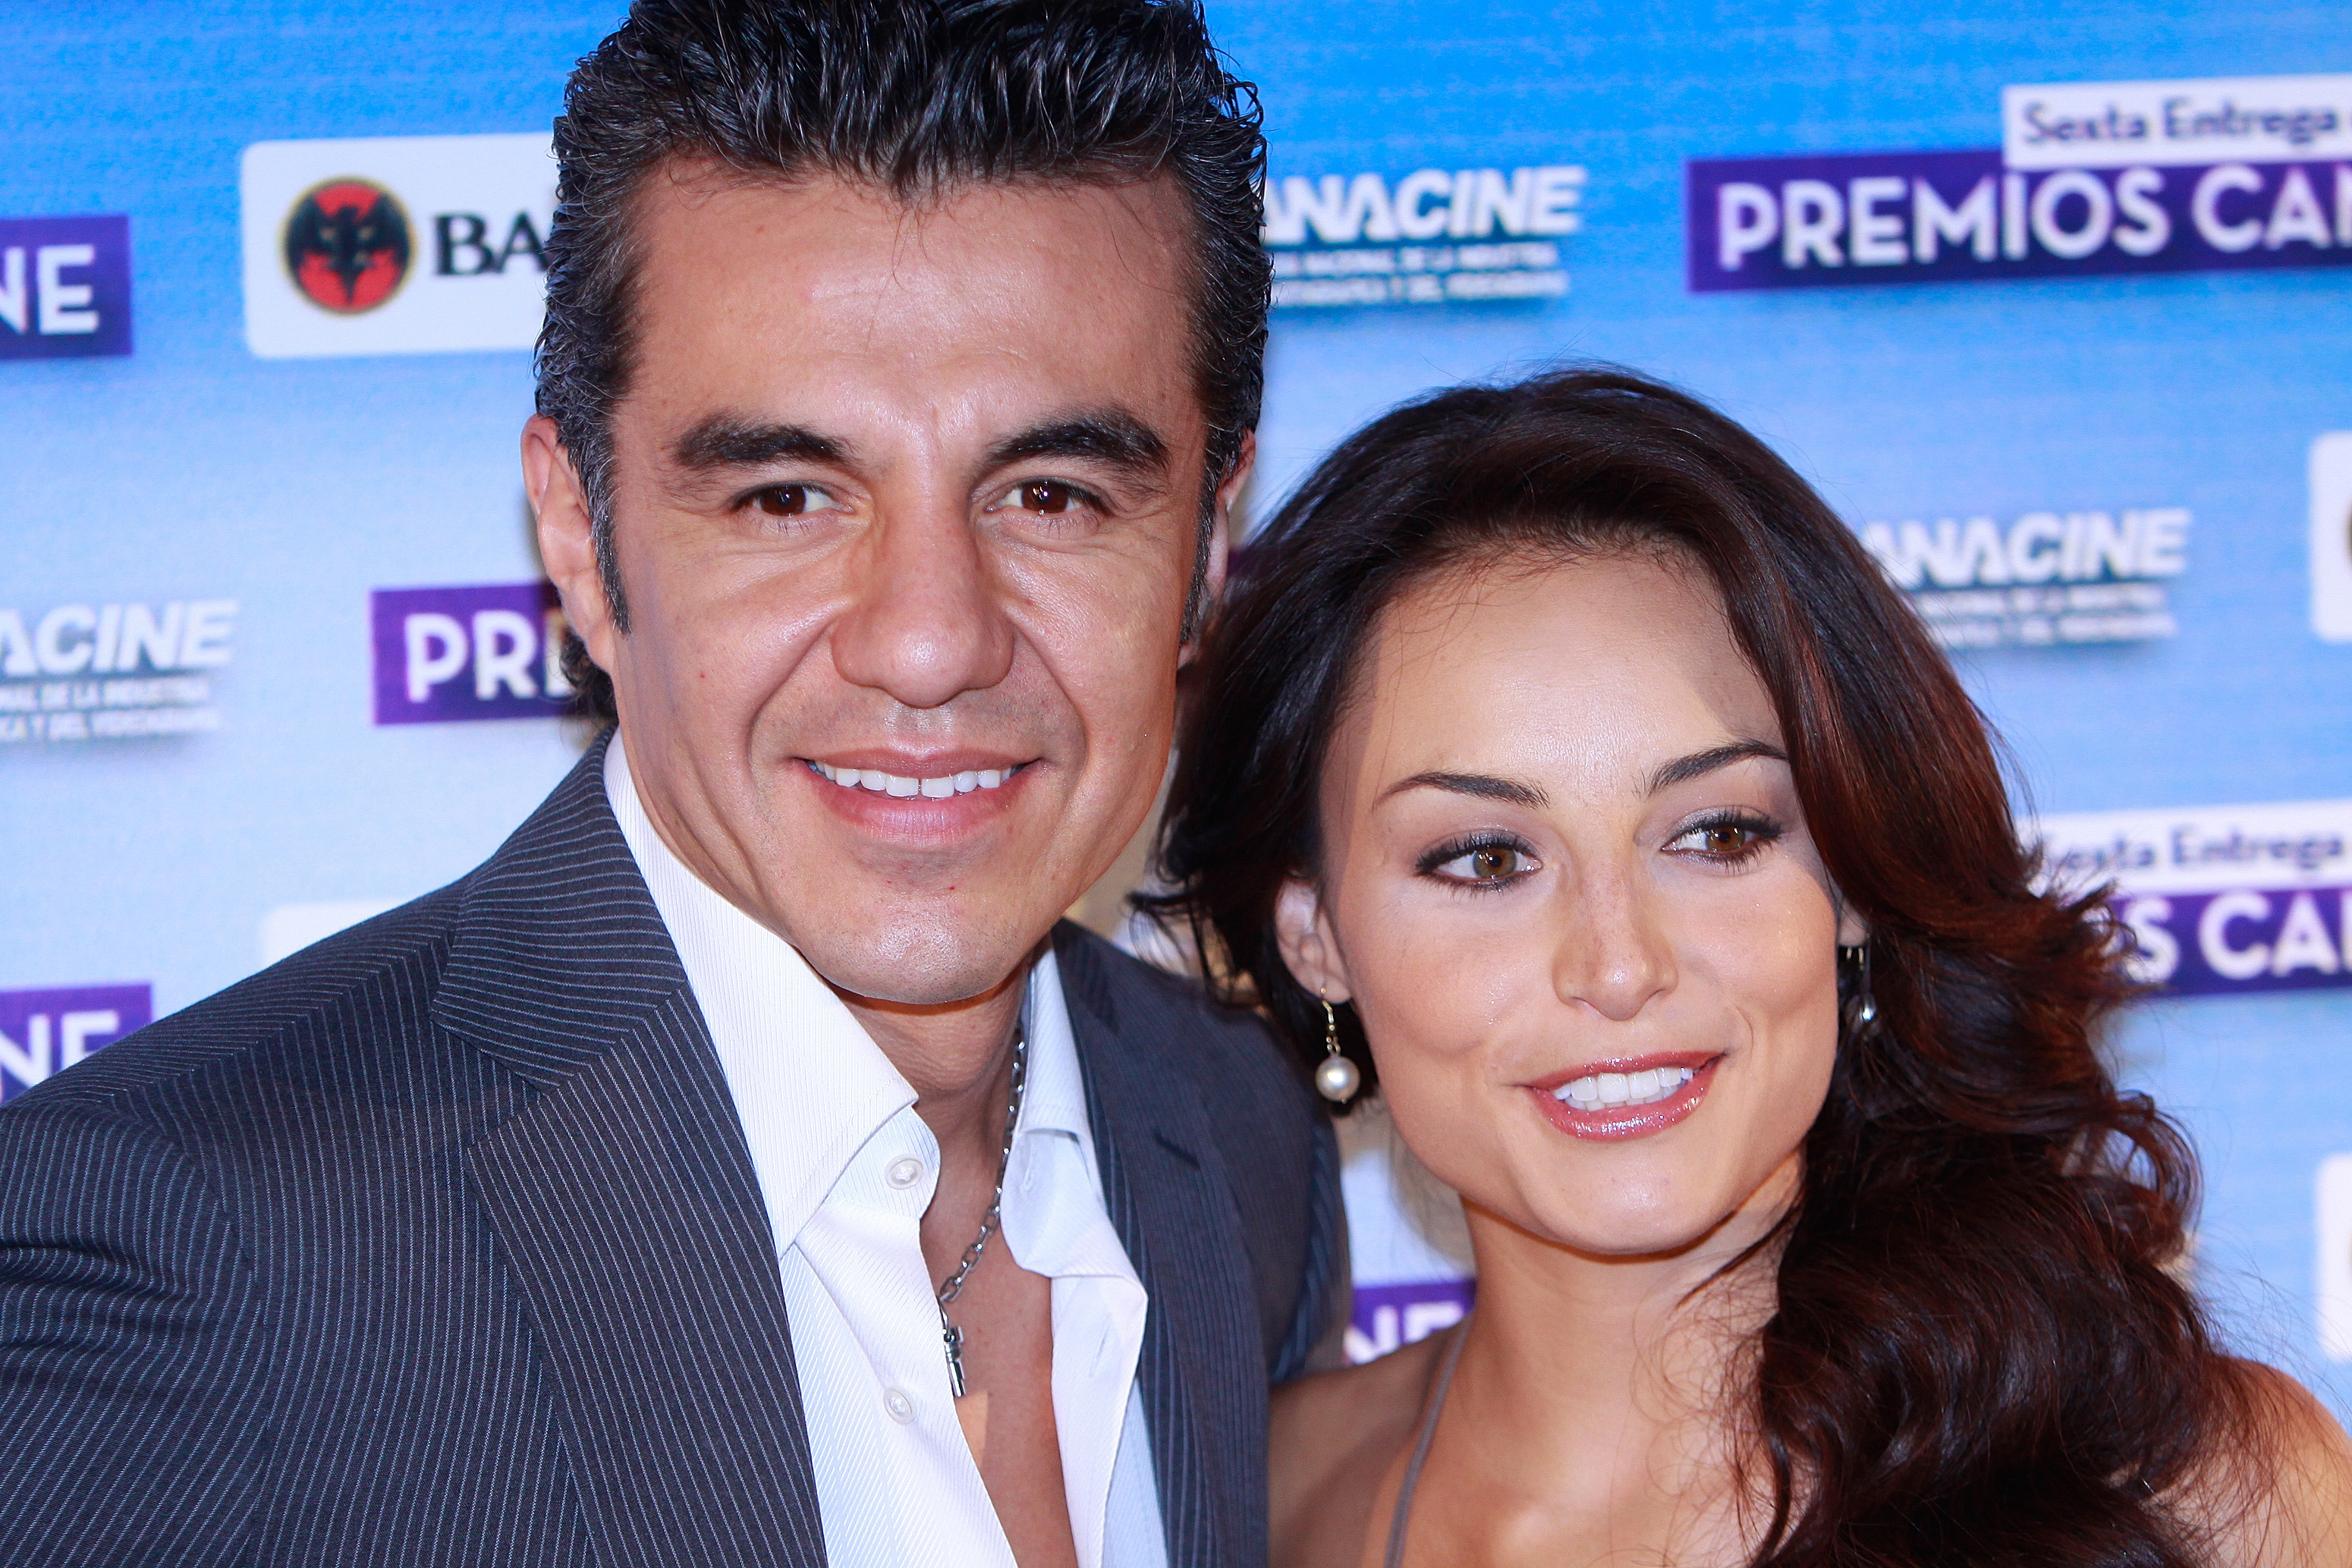 Canacine Awards In Mexico